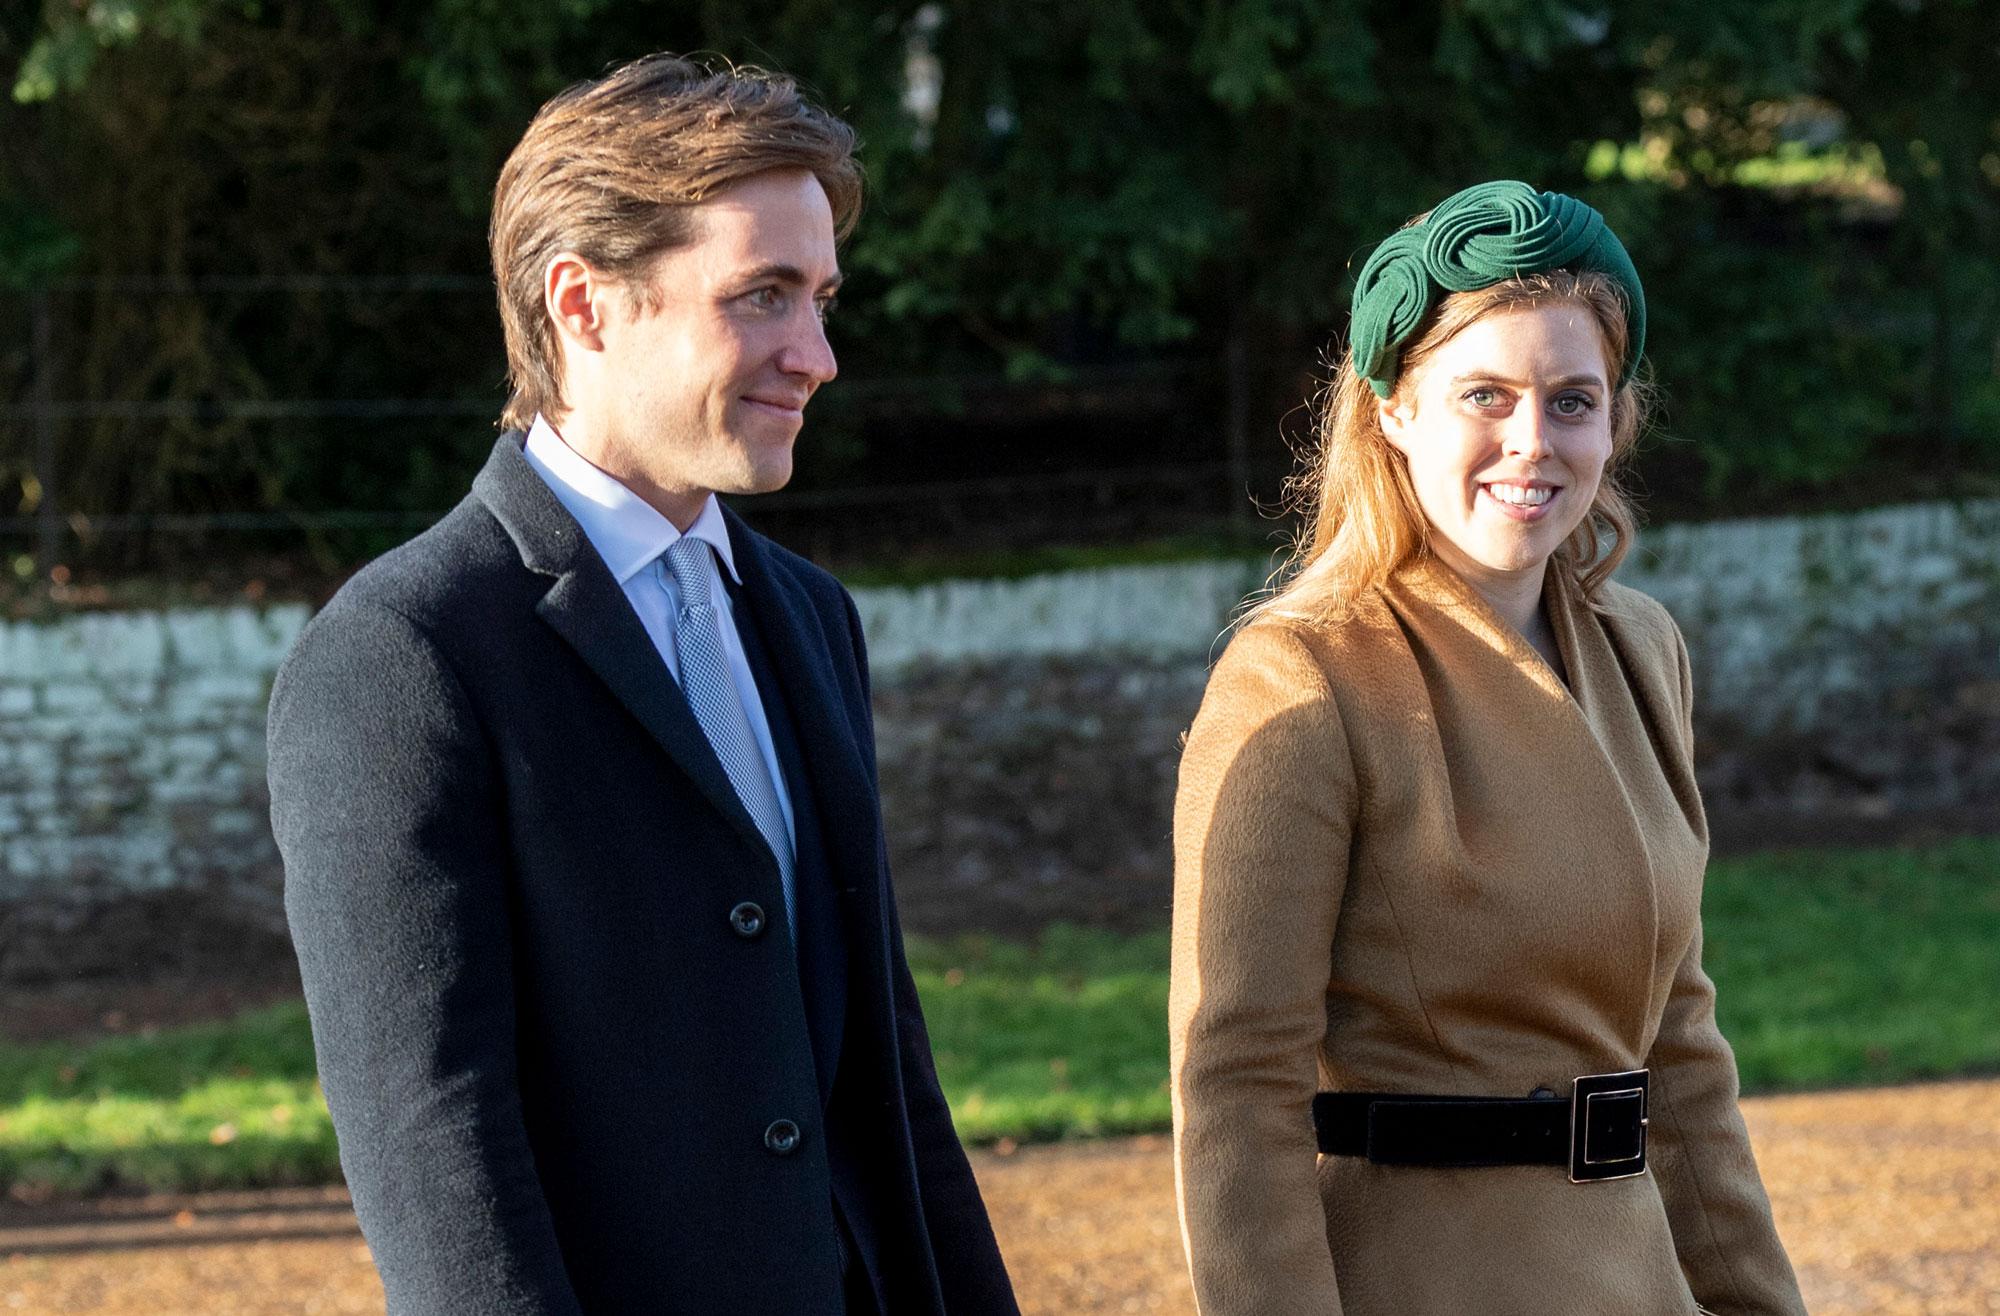 Princess Beatrice Married Buckingham Palace Confirms Princess